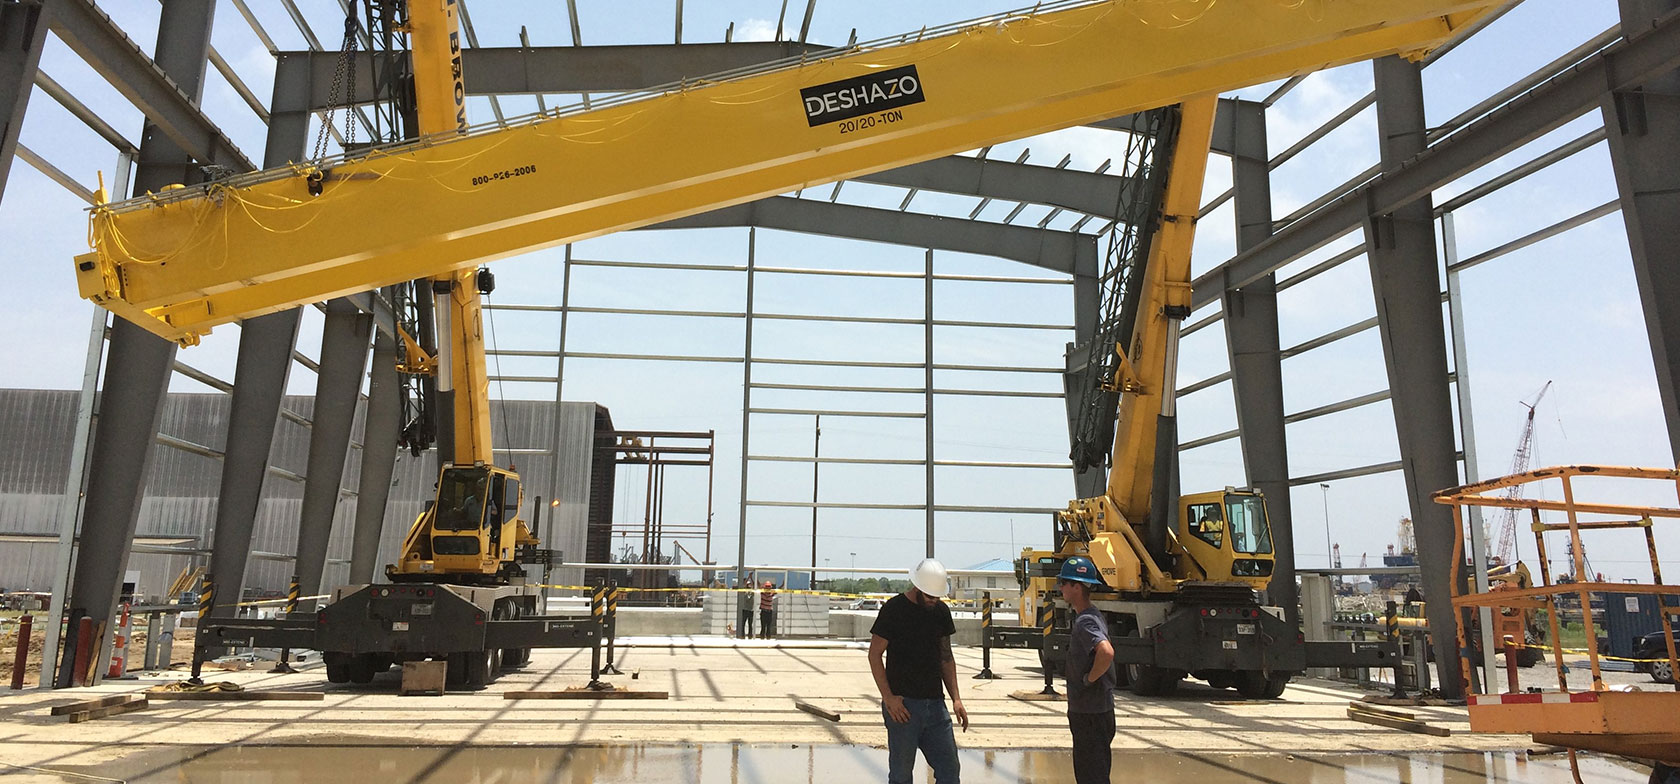 DESHAZO crane manufacturers work on job site with yellow bridge crane